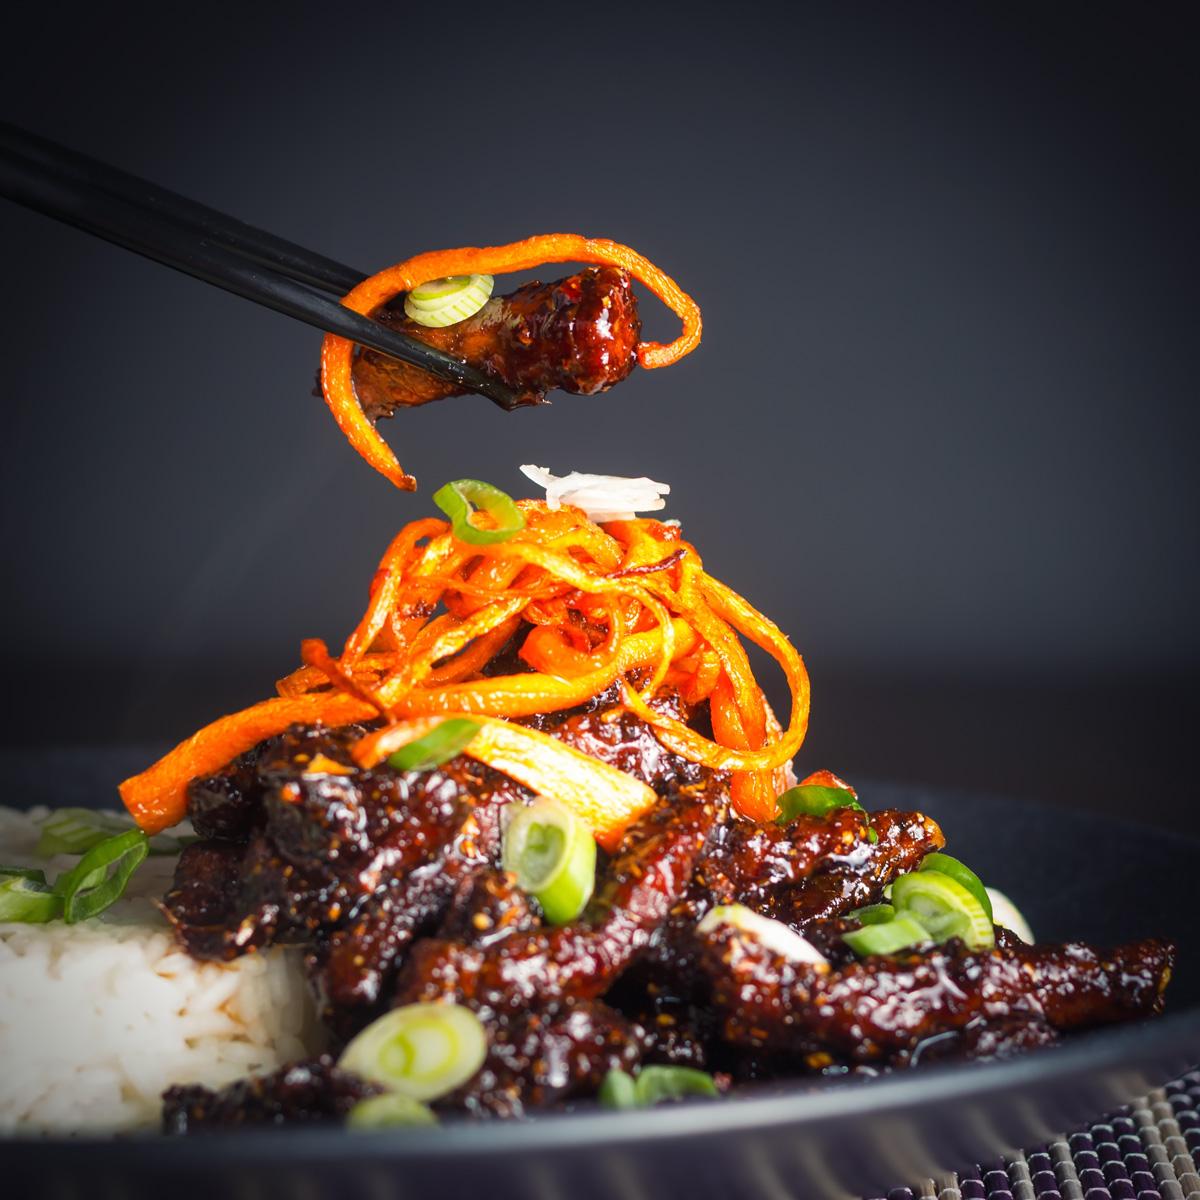 Sticky Chili Beef